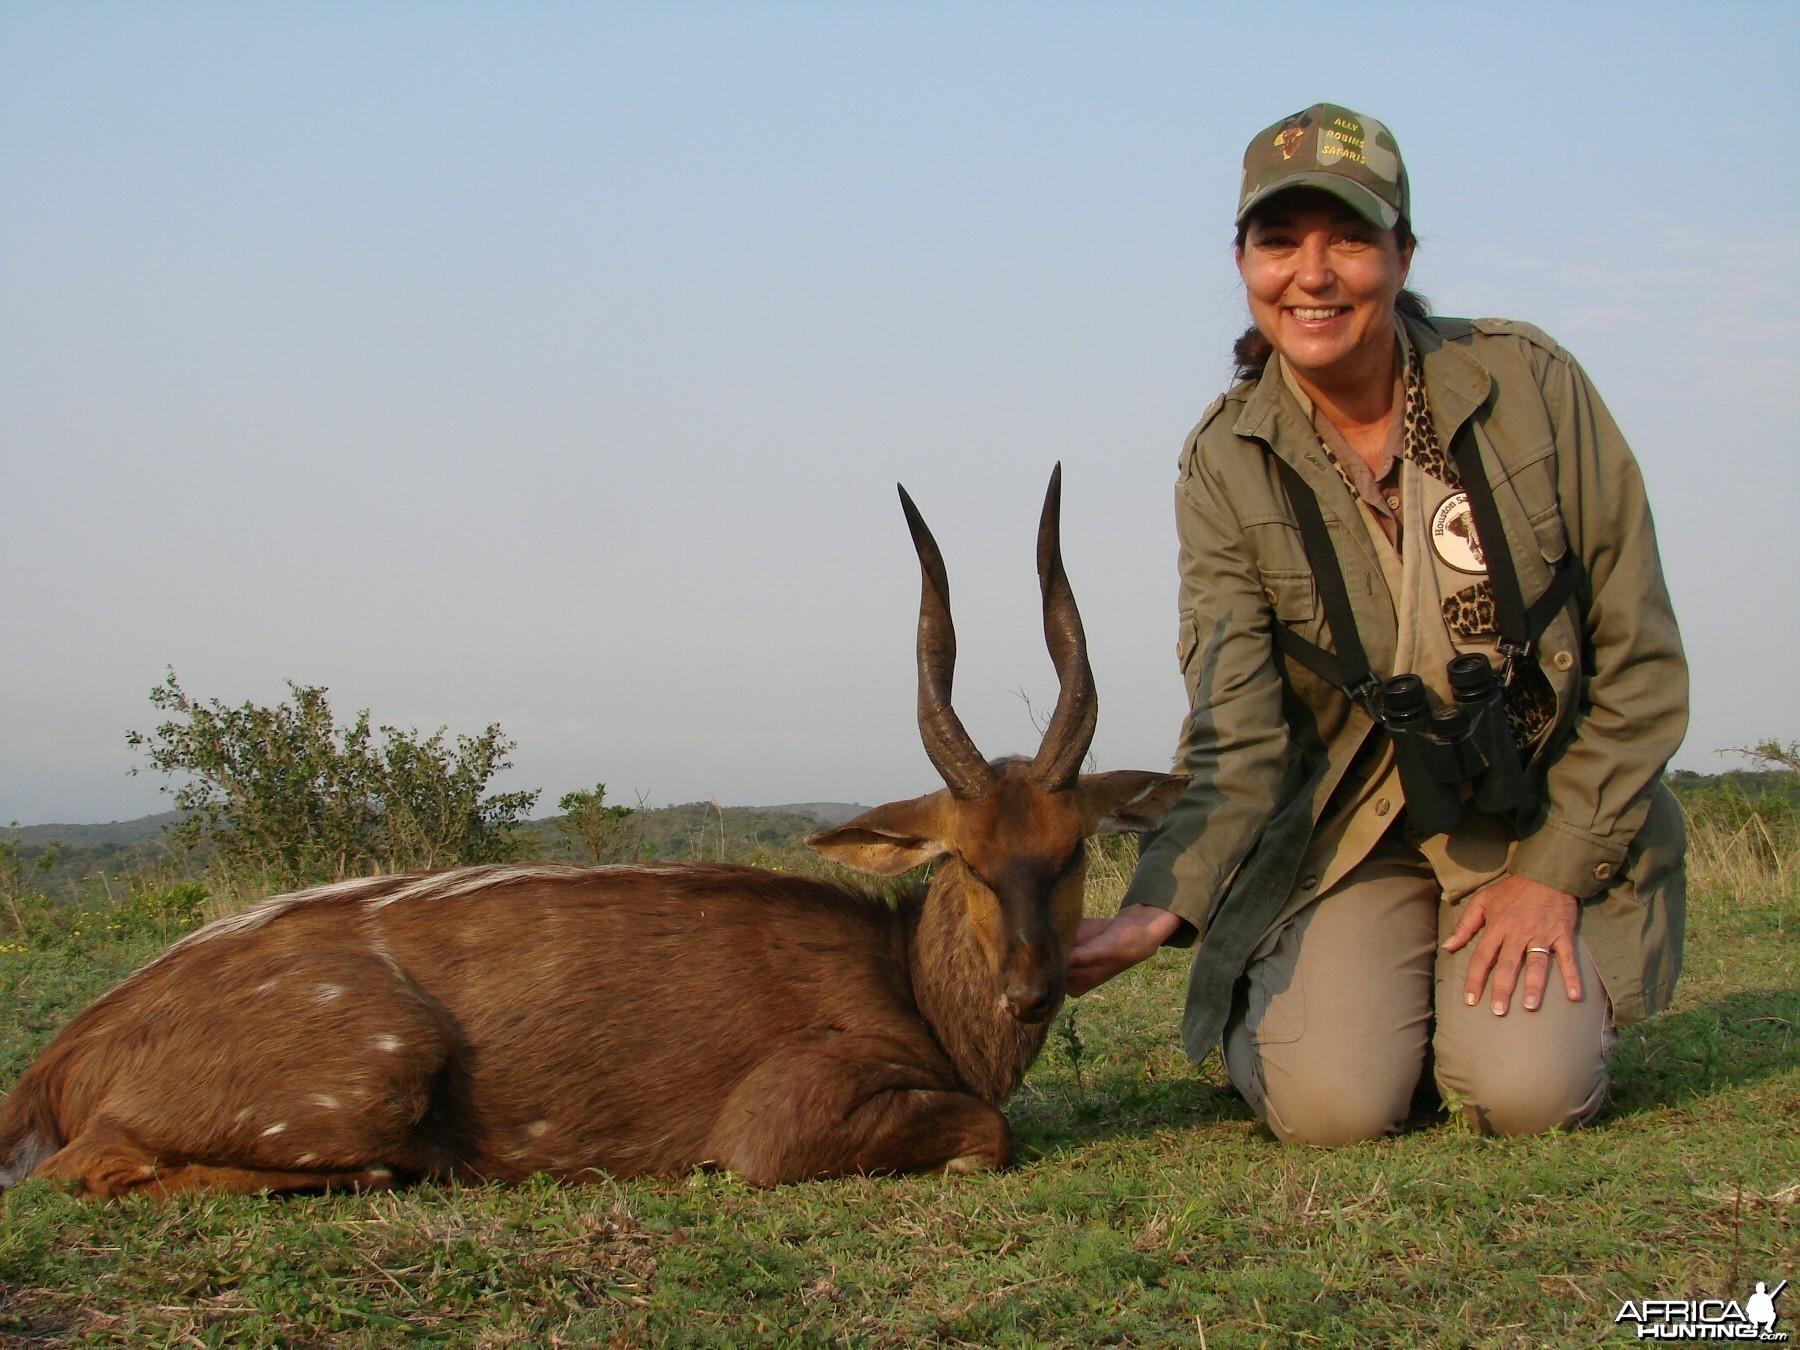 Bushbuck Kwa Zulu Natal, SA 2007